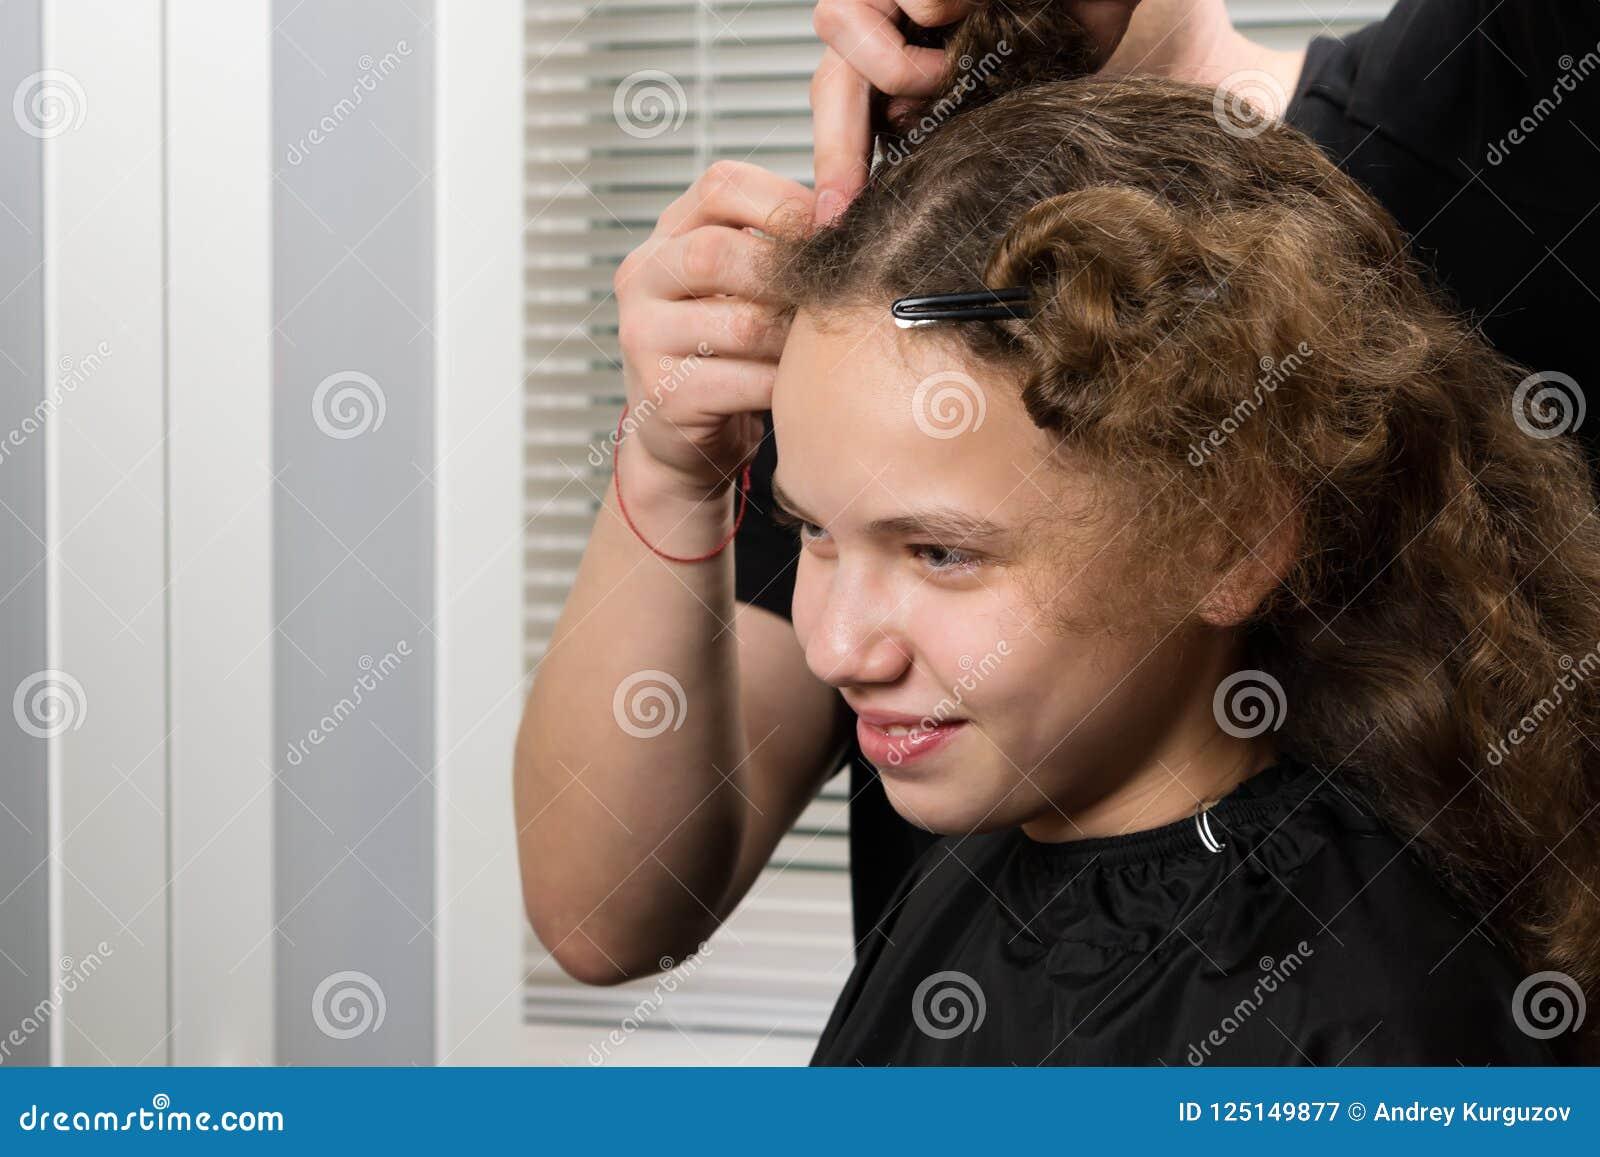 Meisjeszitting in schoonheidssalon en het glimlachen, stilist die aan haar kapsel werken